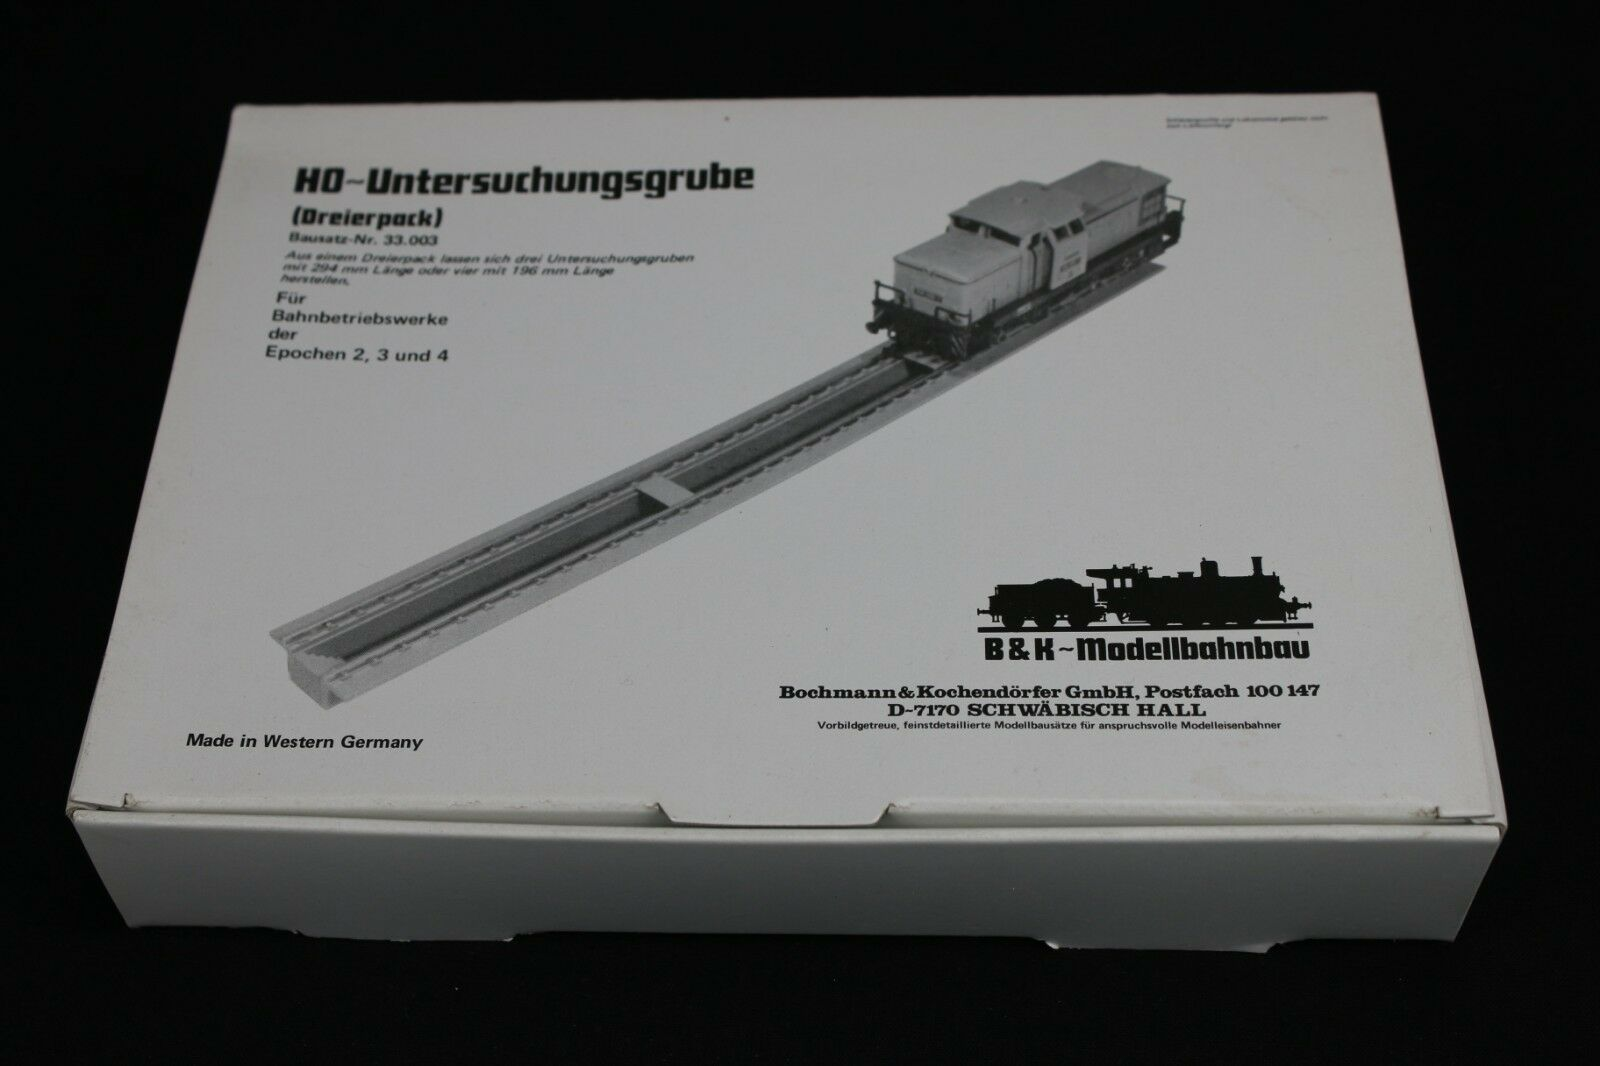 W388 bochmann kochendorfe ho tren 33.003 untersuchunggrube driepack